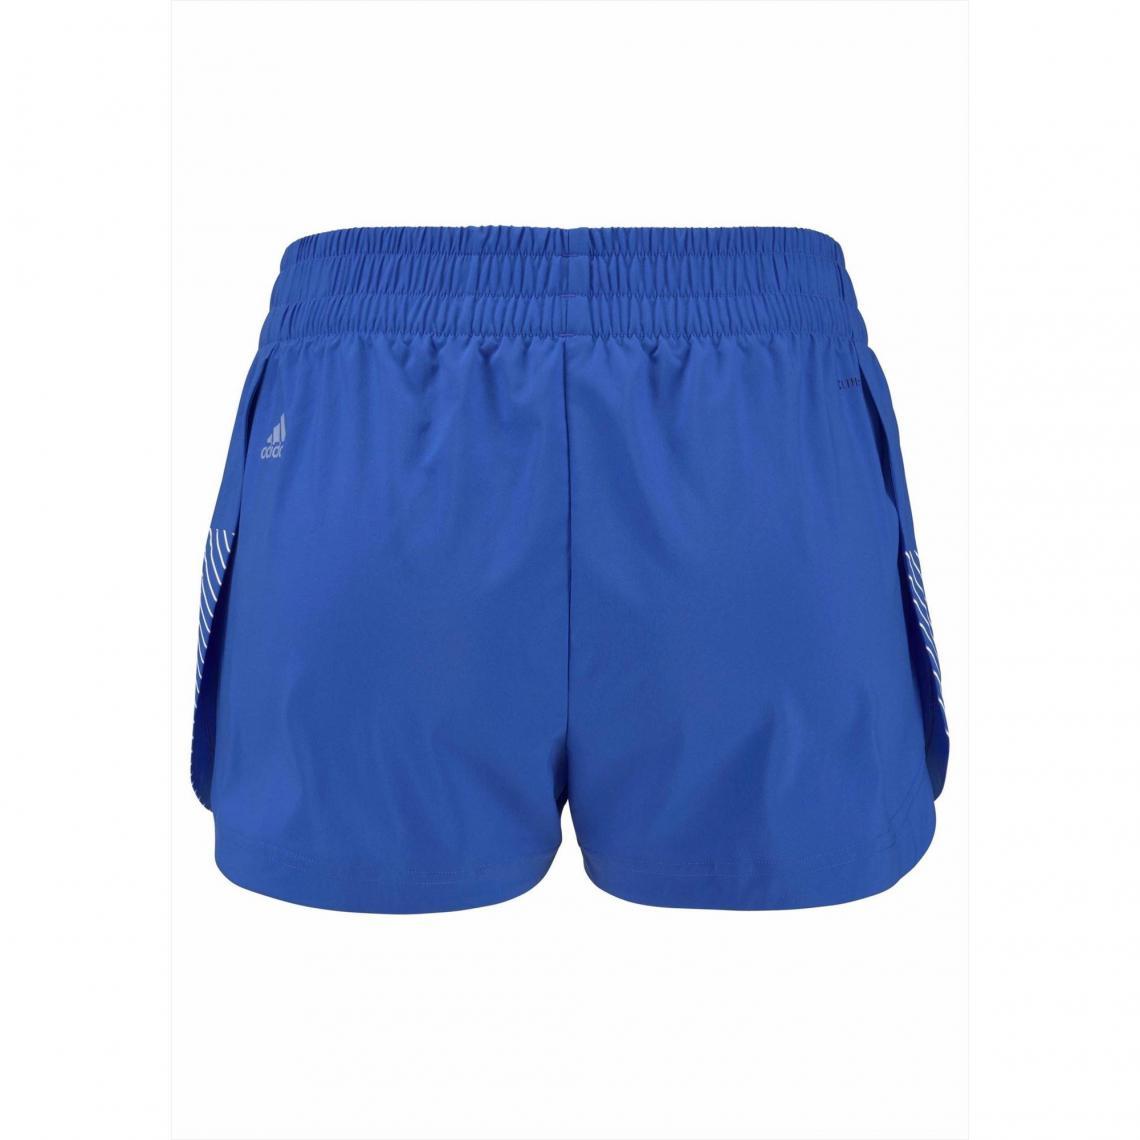 Short femme Adidas Performance - Bleu Adidas Performance 643e1ffe558